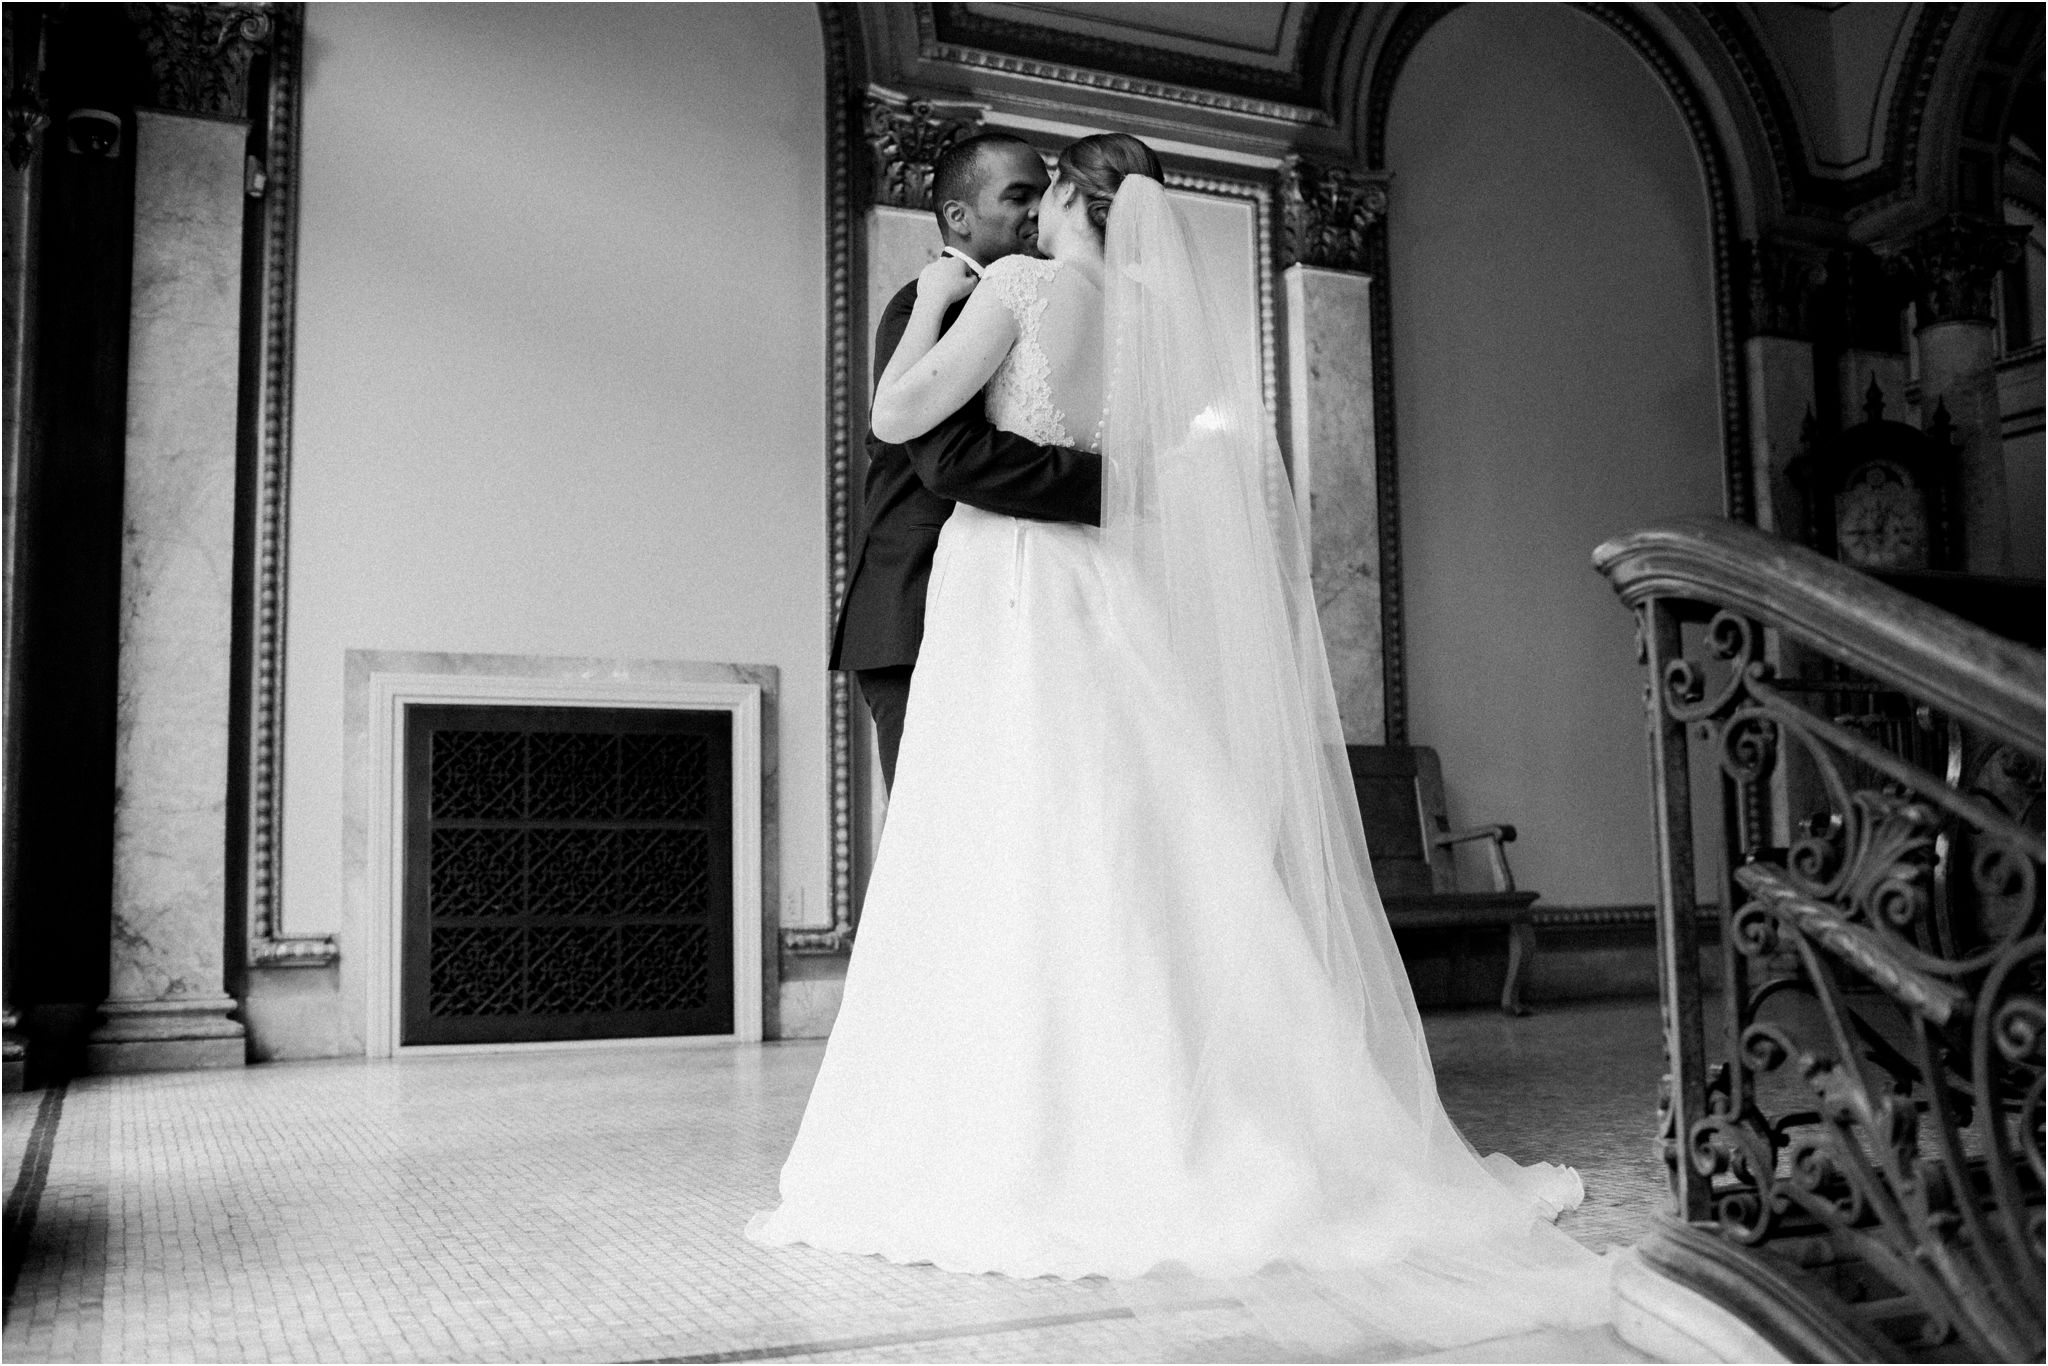 providence-public-library-wedding-images_00033.JPG